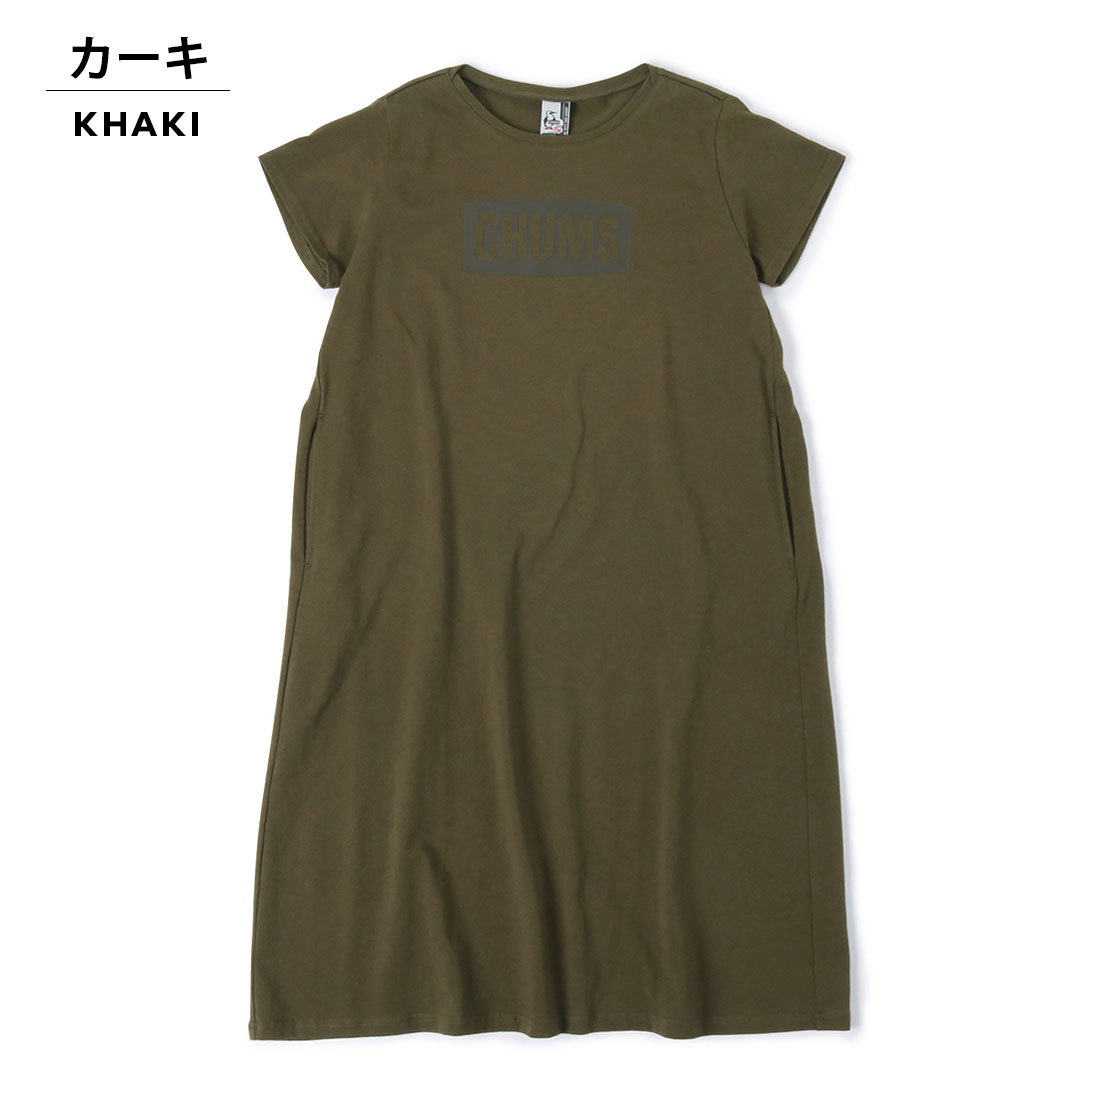 CHUMS チャムス【送料無料】 CHUMS Logo Dress レディース(WM WL)ワンピース【メール便不可】